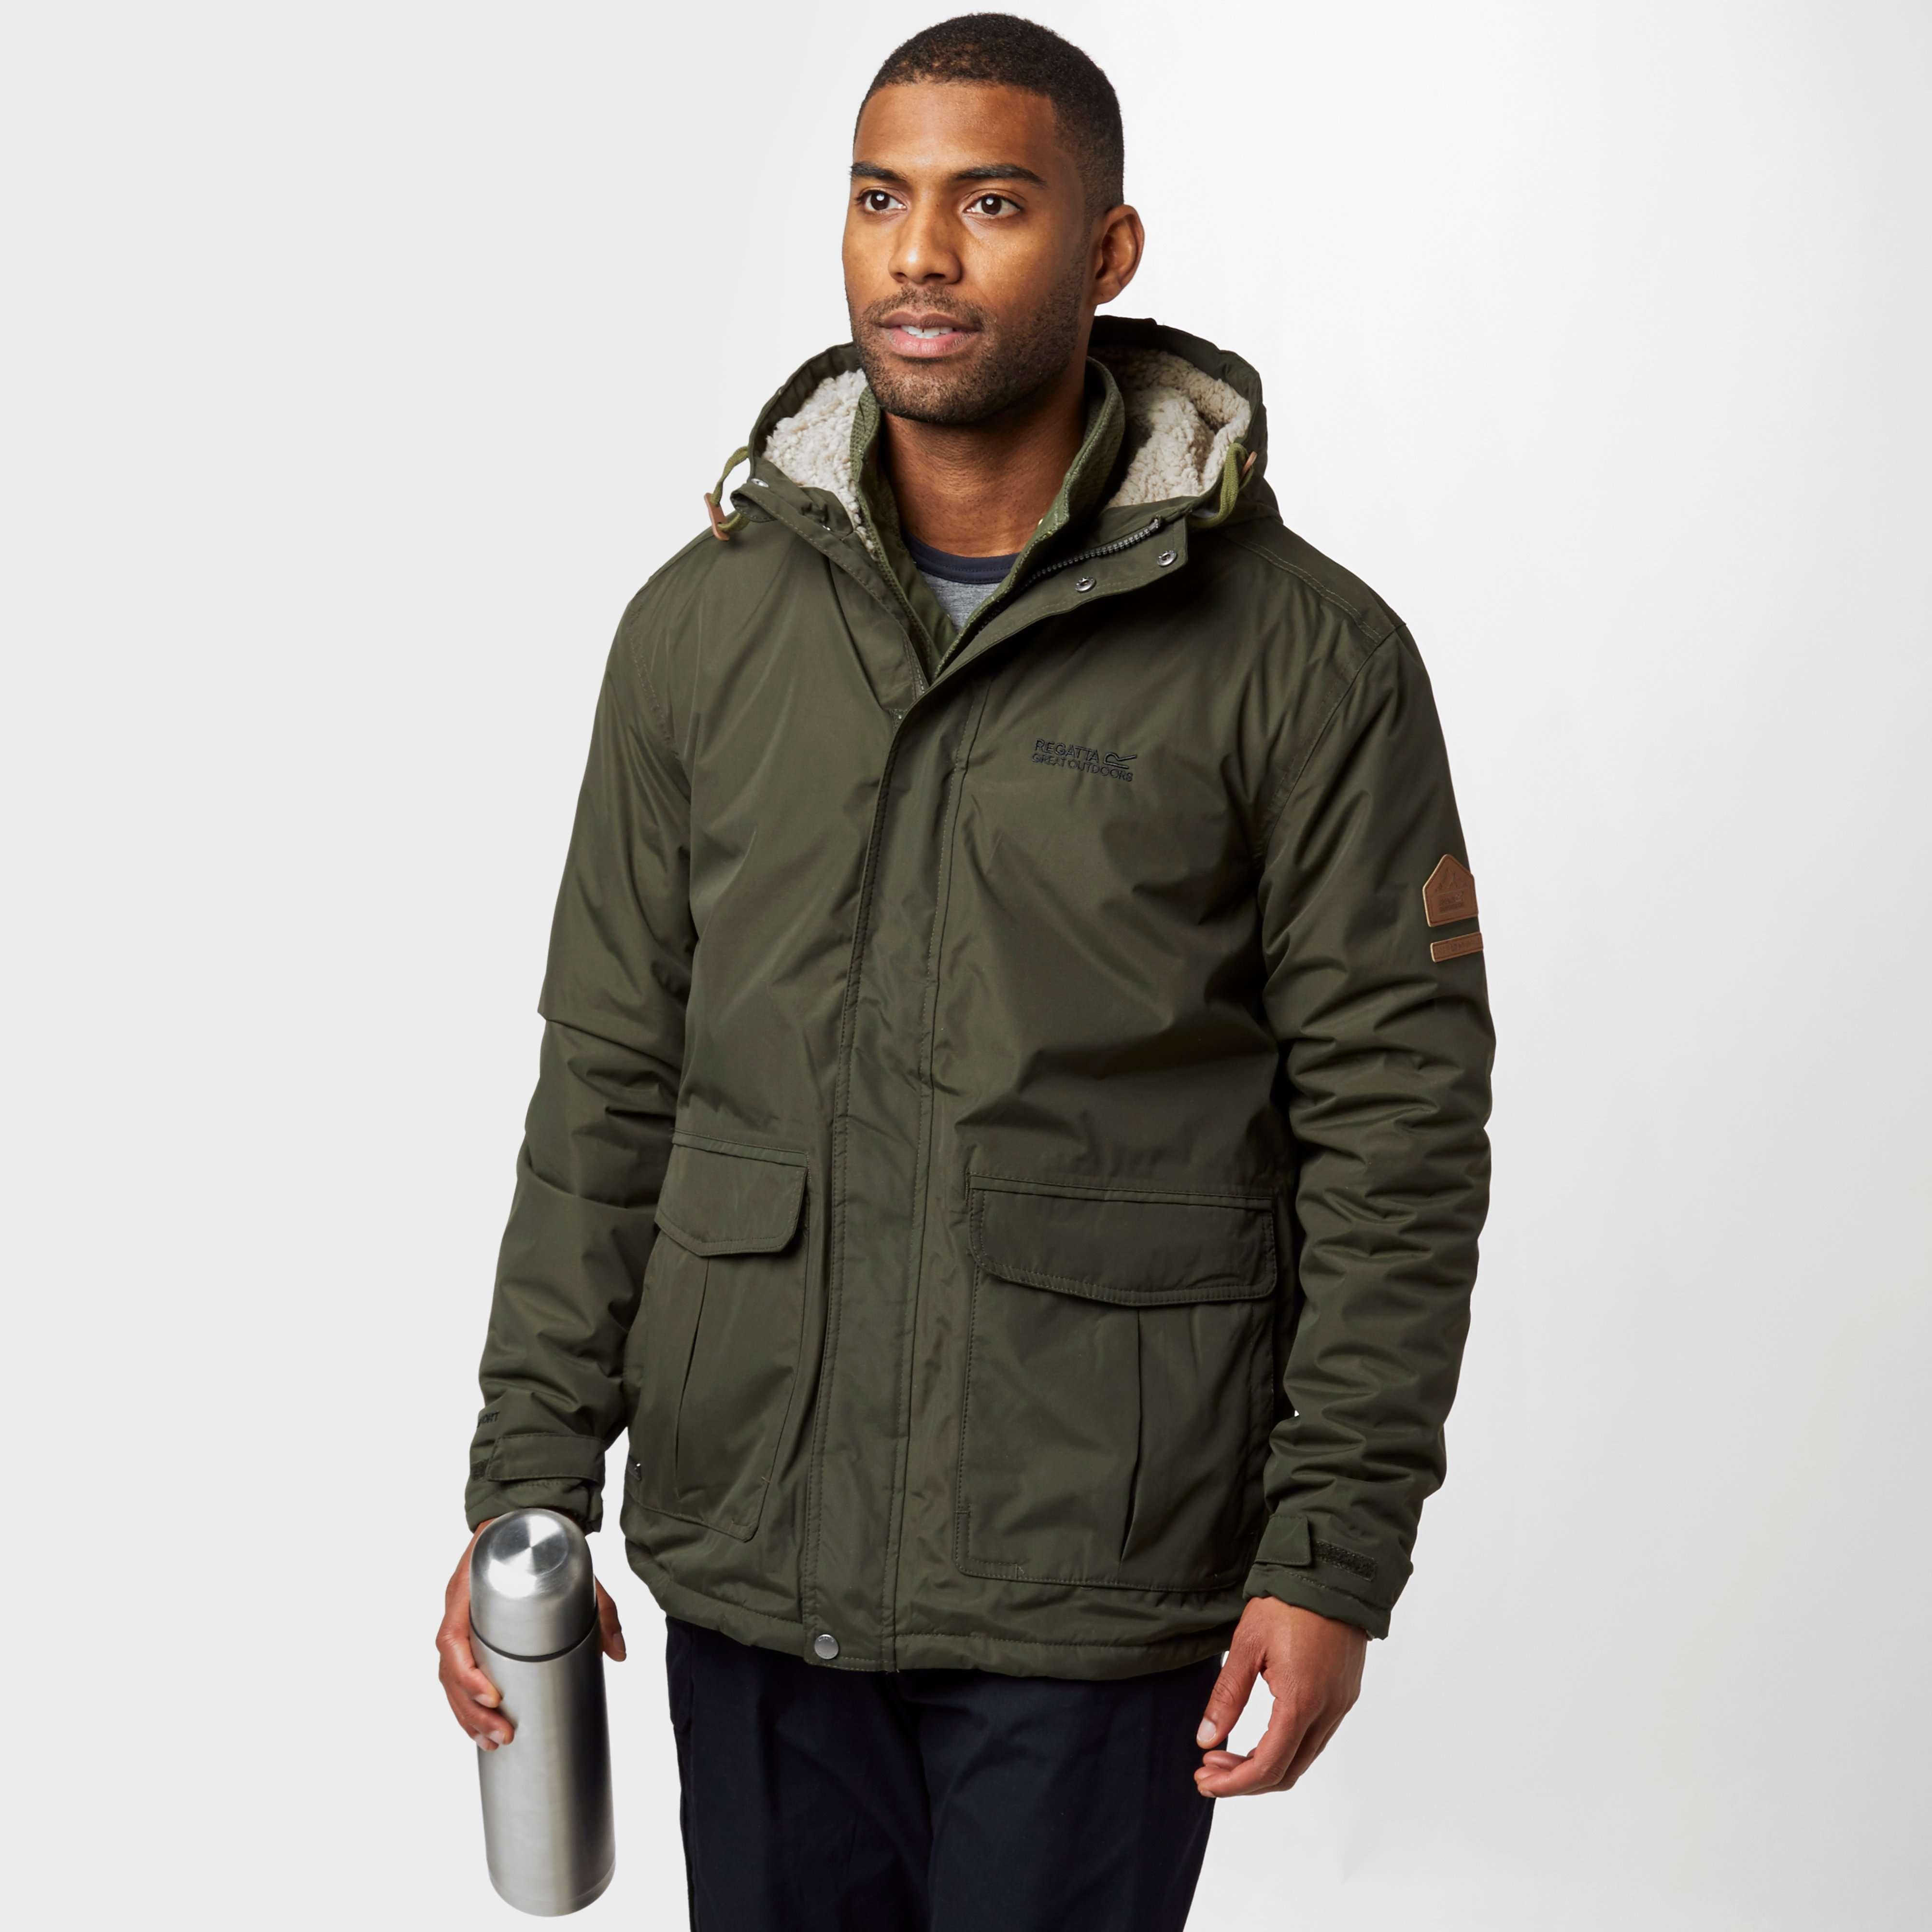 REGATTA Men's Sternway Waterproof Jacket